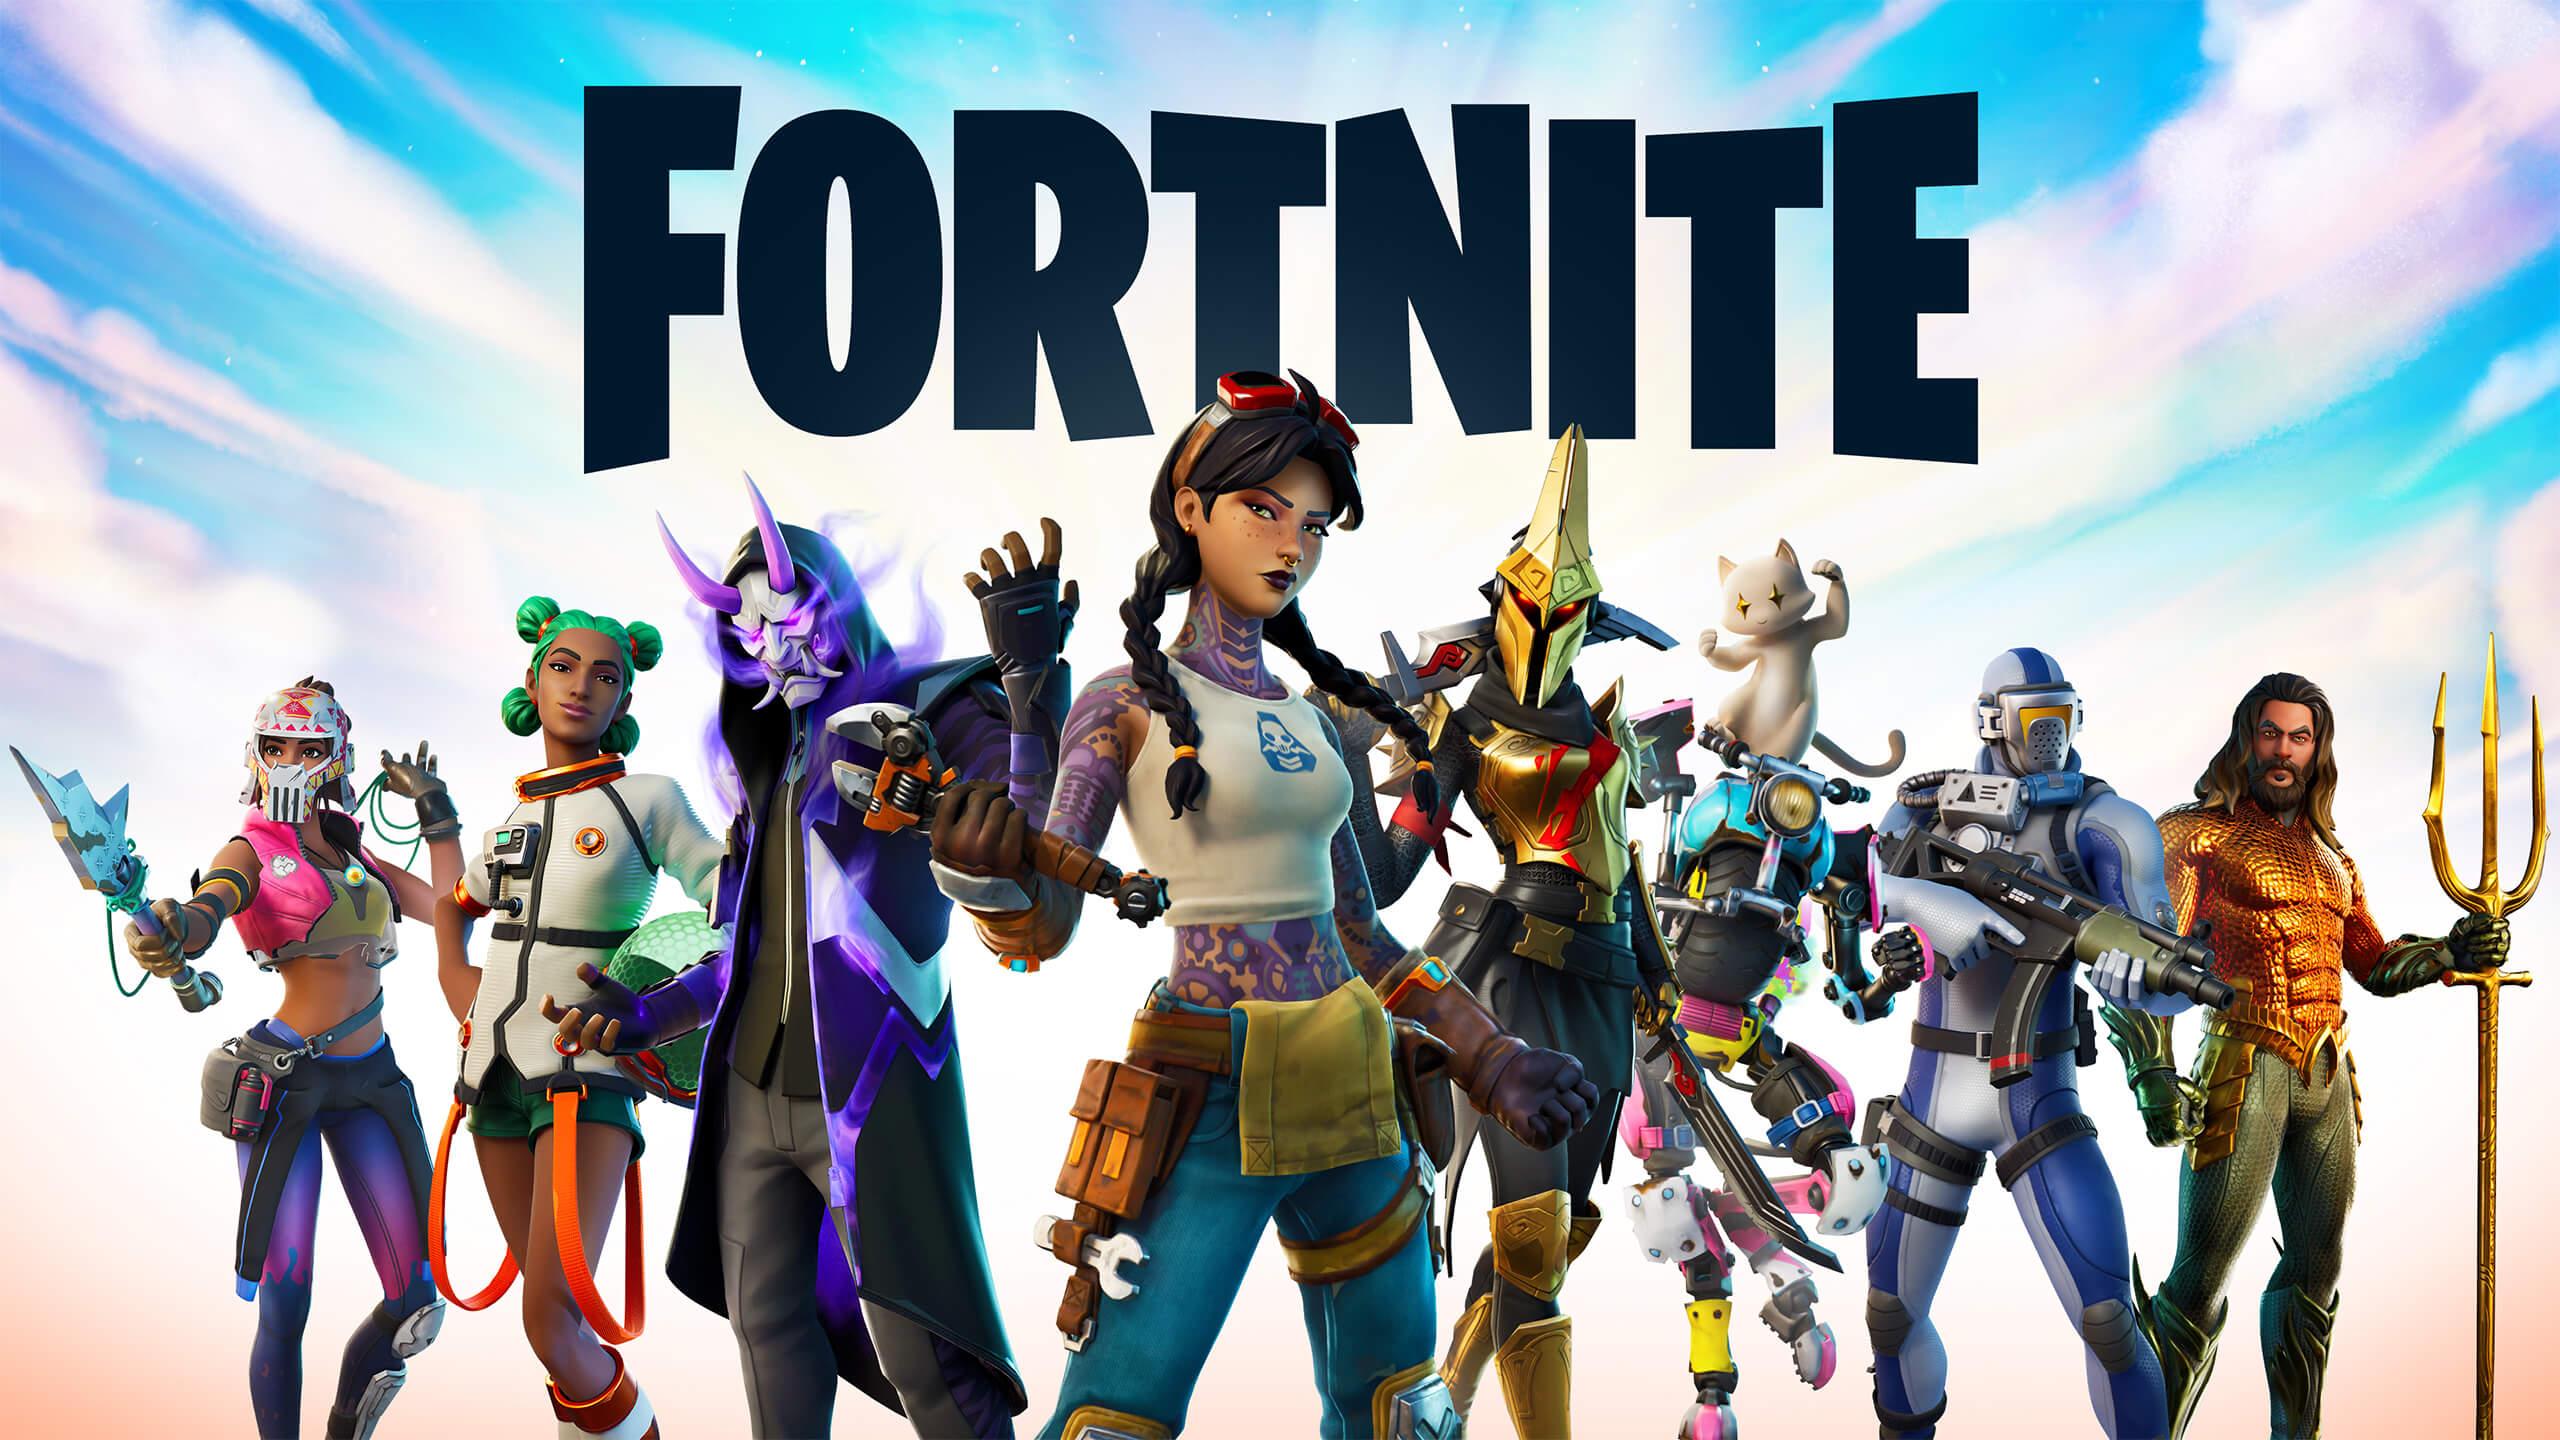 Epic Game's Fortnite